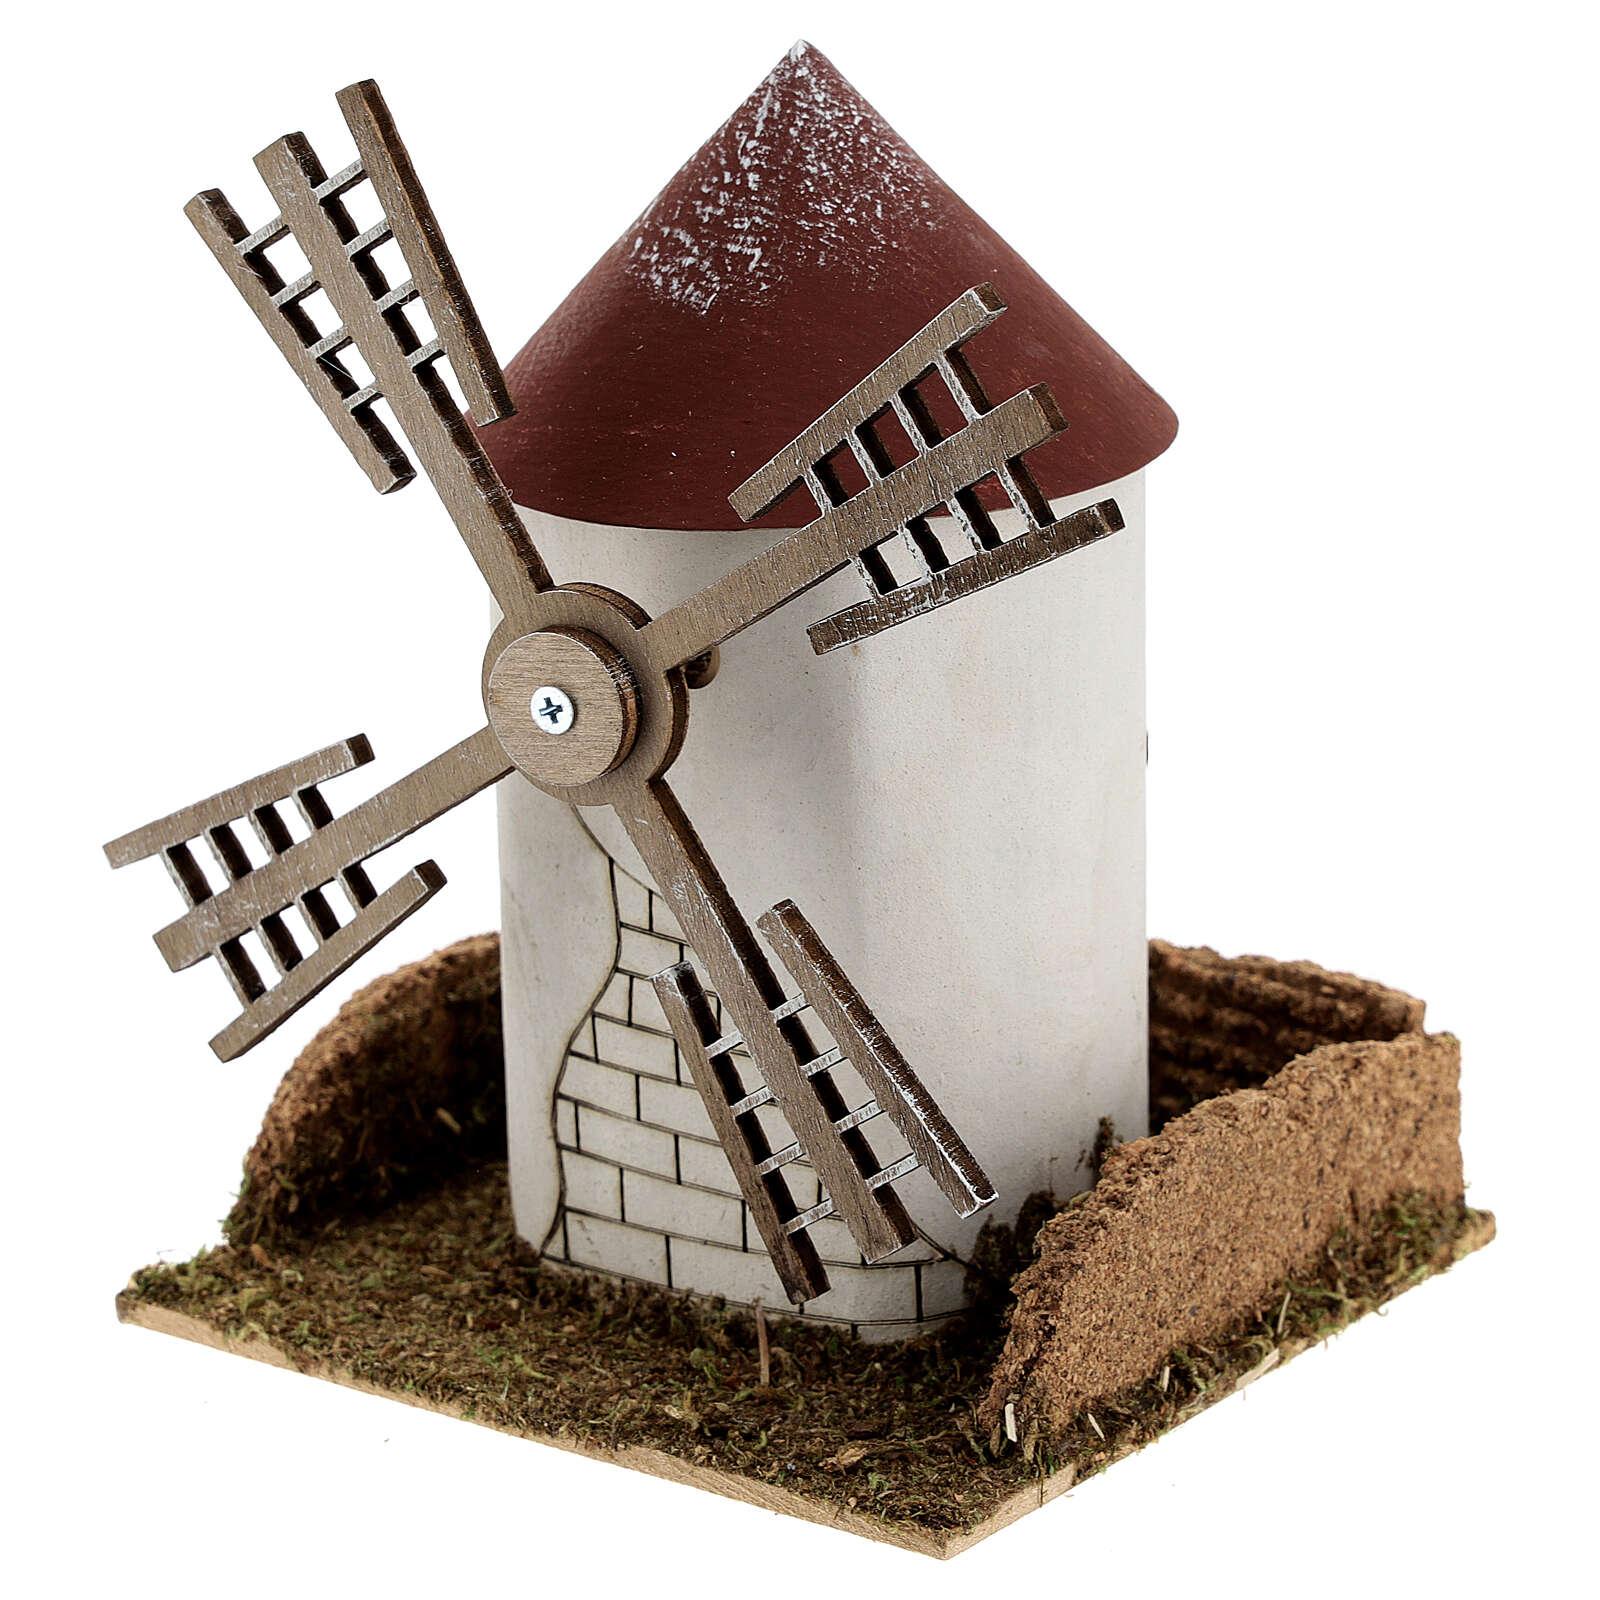 Mulino a vento pala fiamminga funzionante 20x15x15 cm presepi 4-6 cm 4